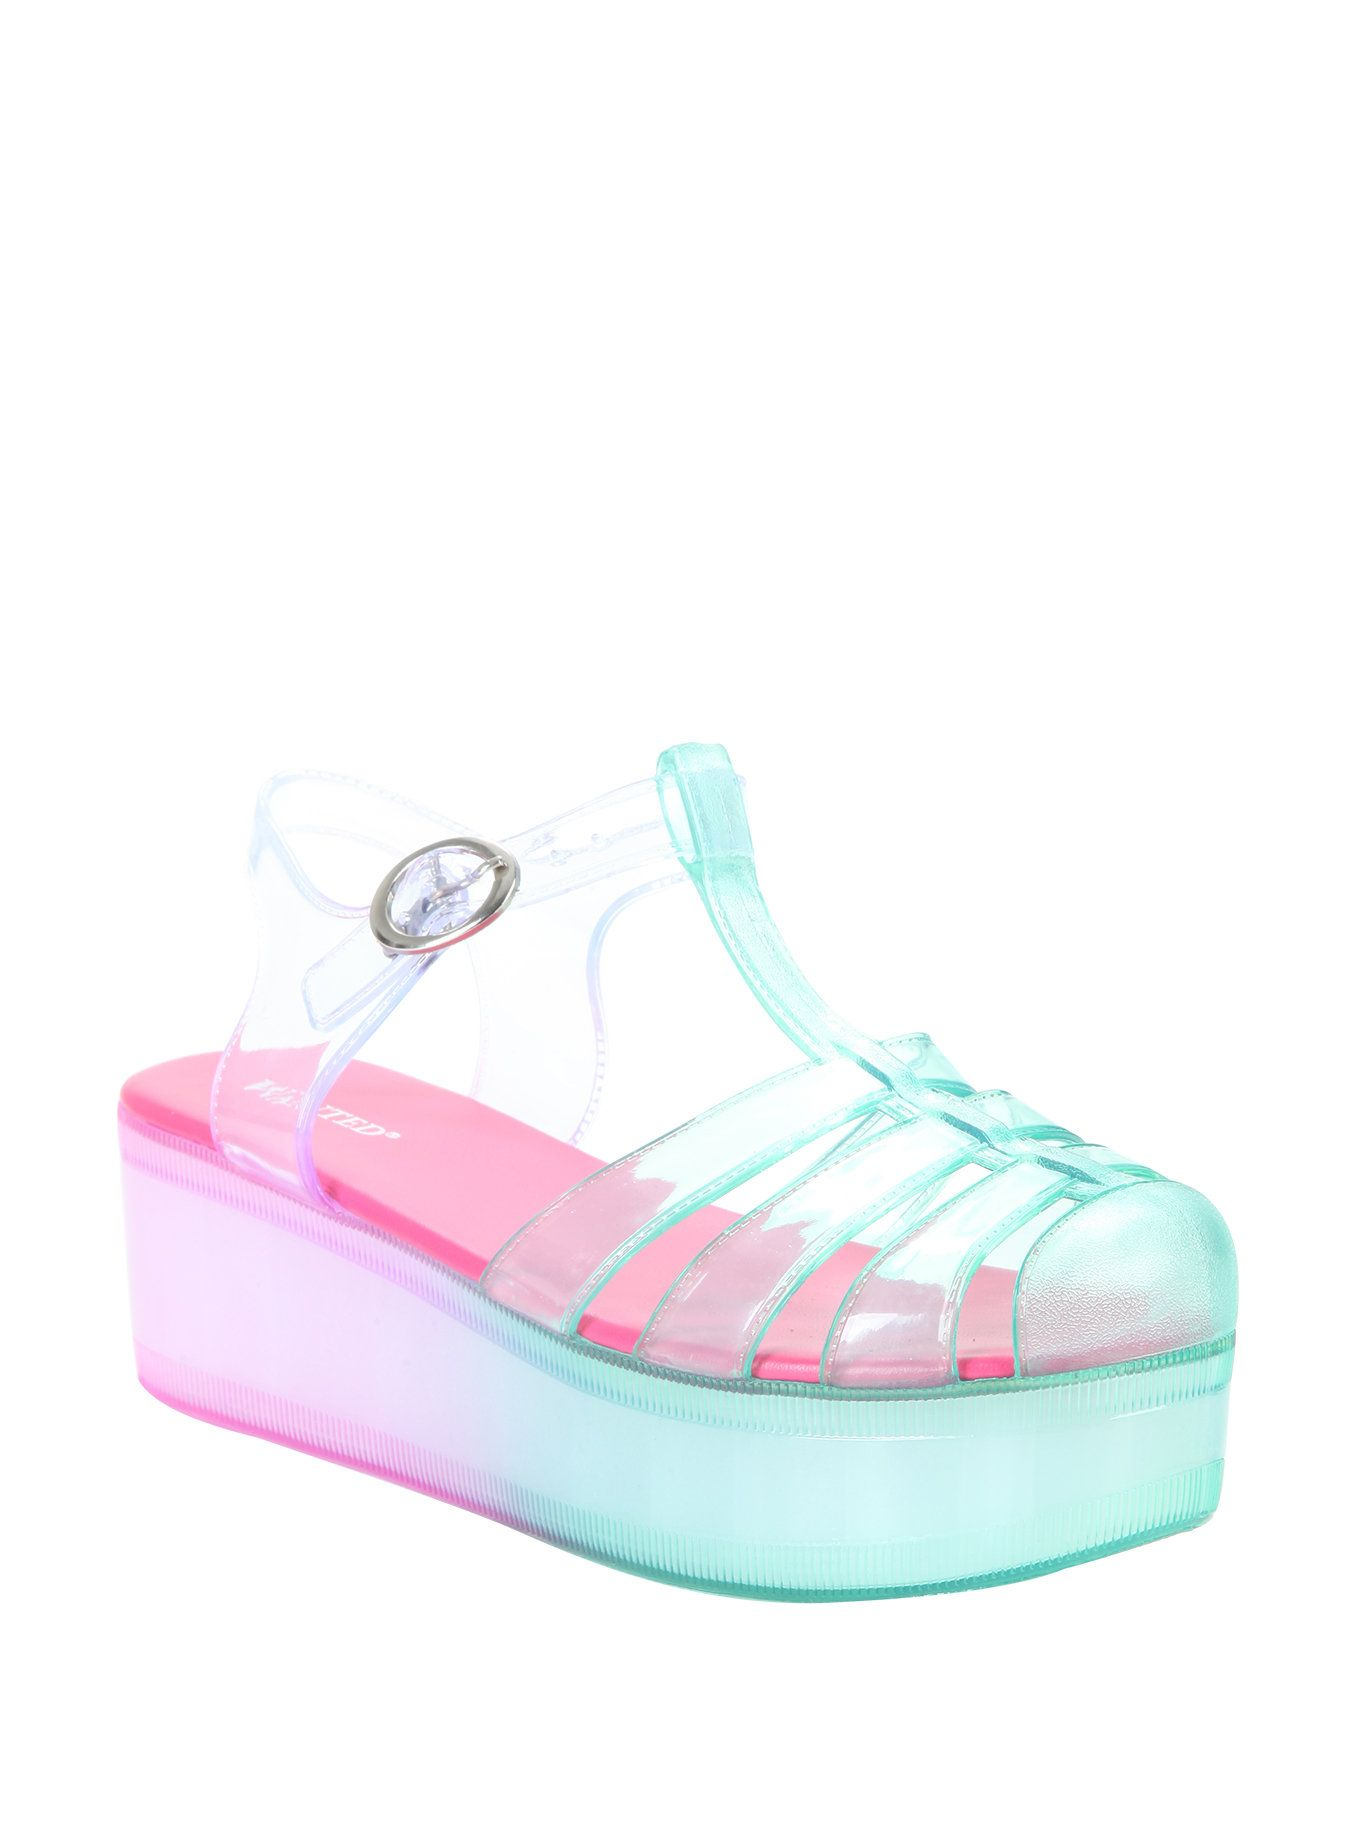 ab7f31bfe069 Pink   Seafoam T-Strap Jelly Flatform Sandals